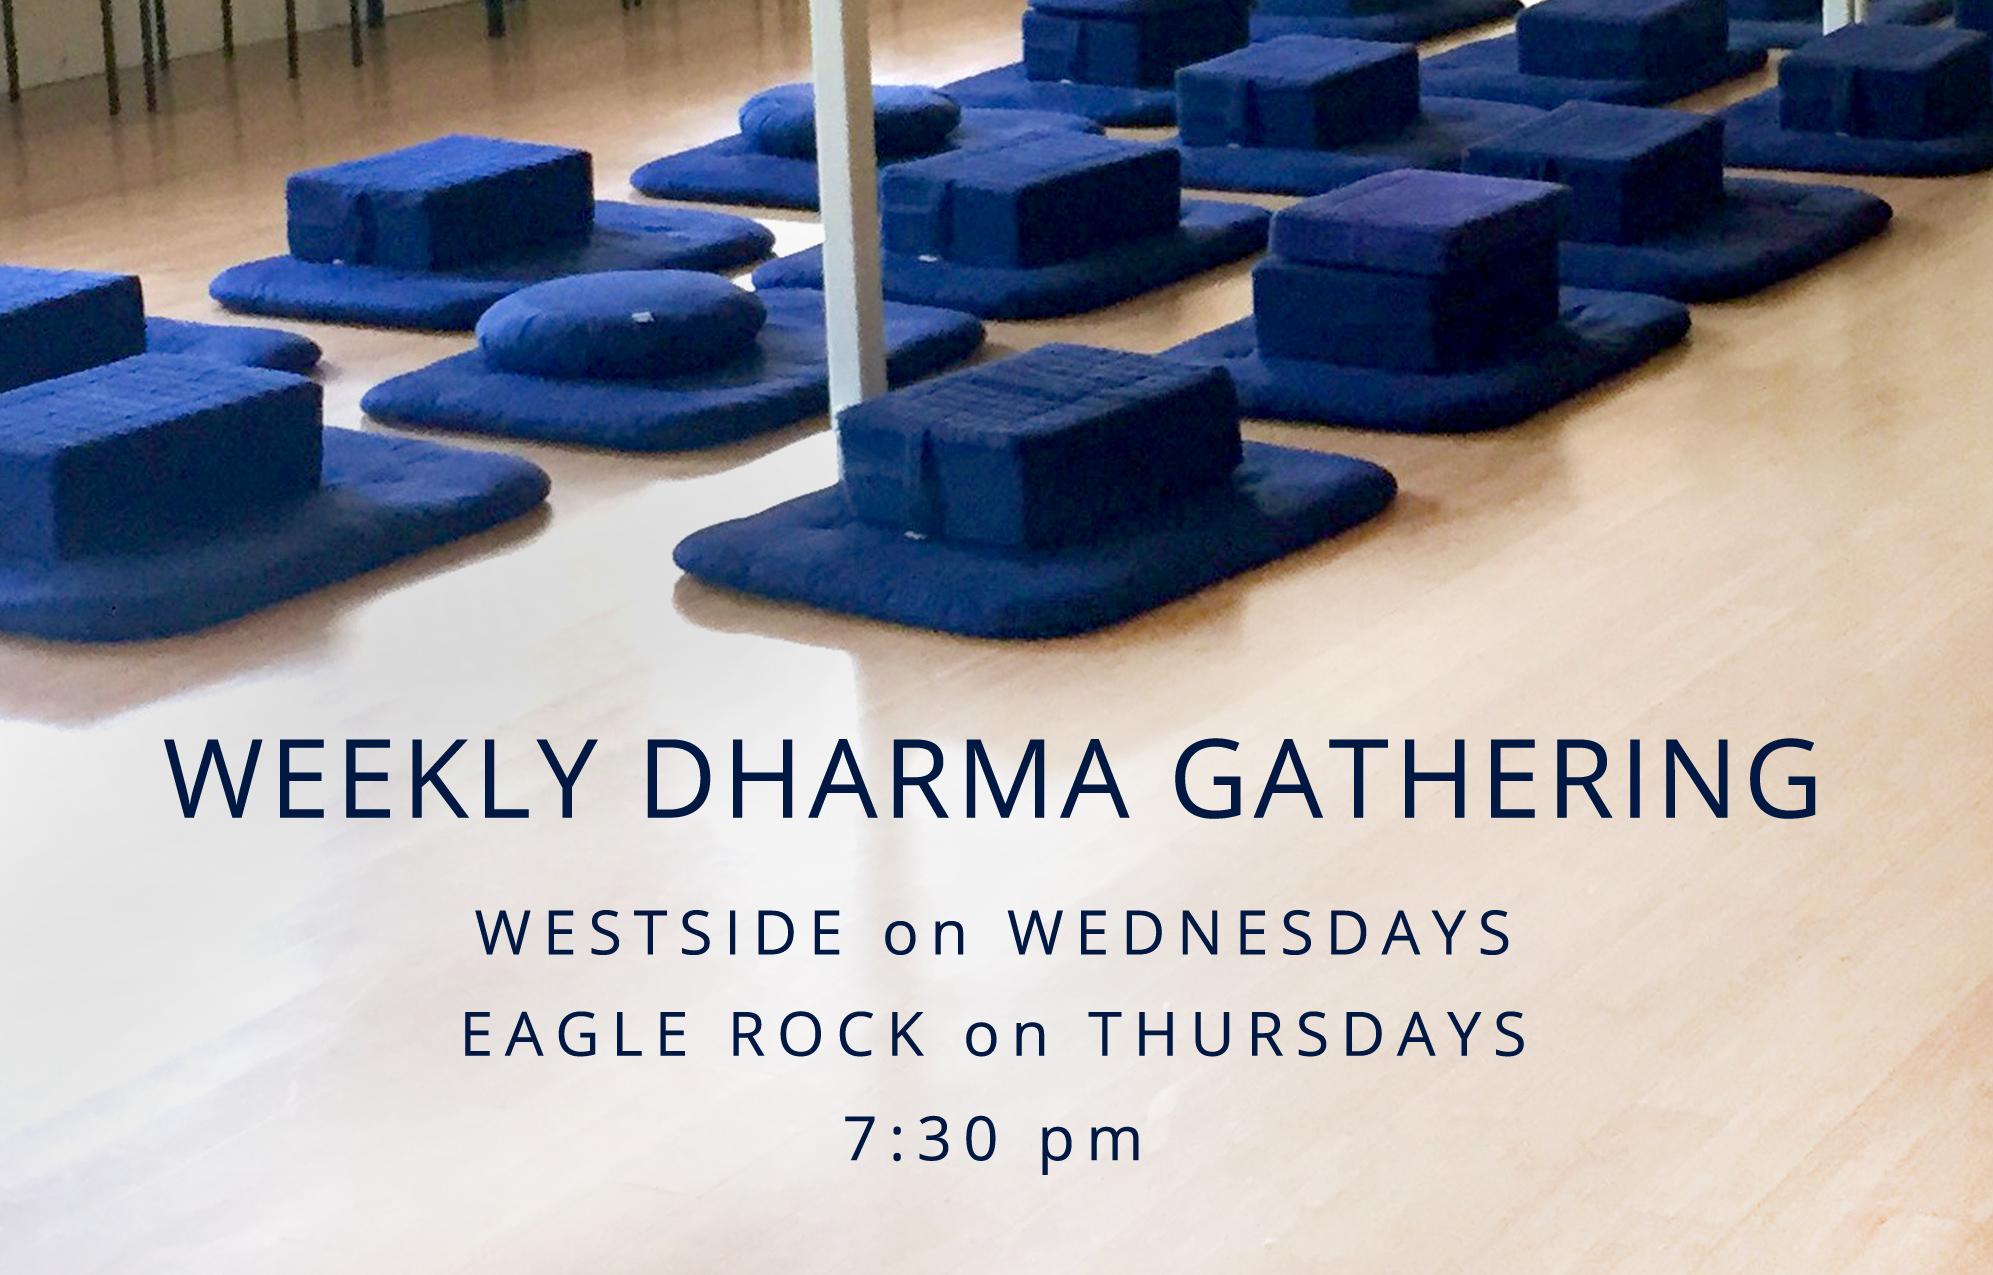 weekly dharma gathering at shambhala center in los angeles